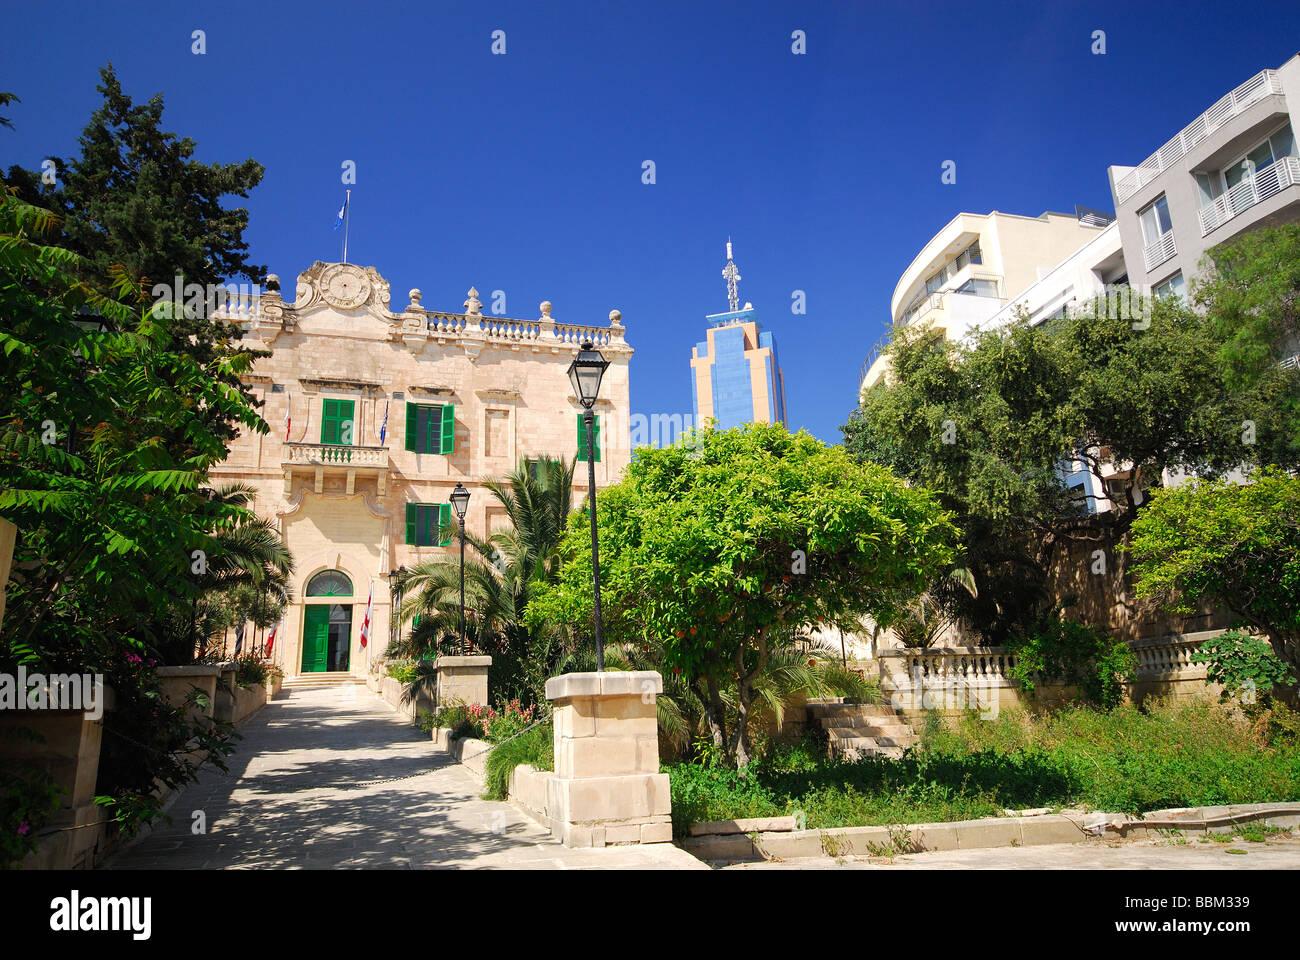 Malta The Gardens At Villa Spinola In St Julian 39 S With